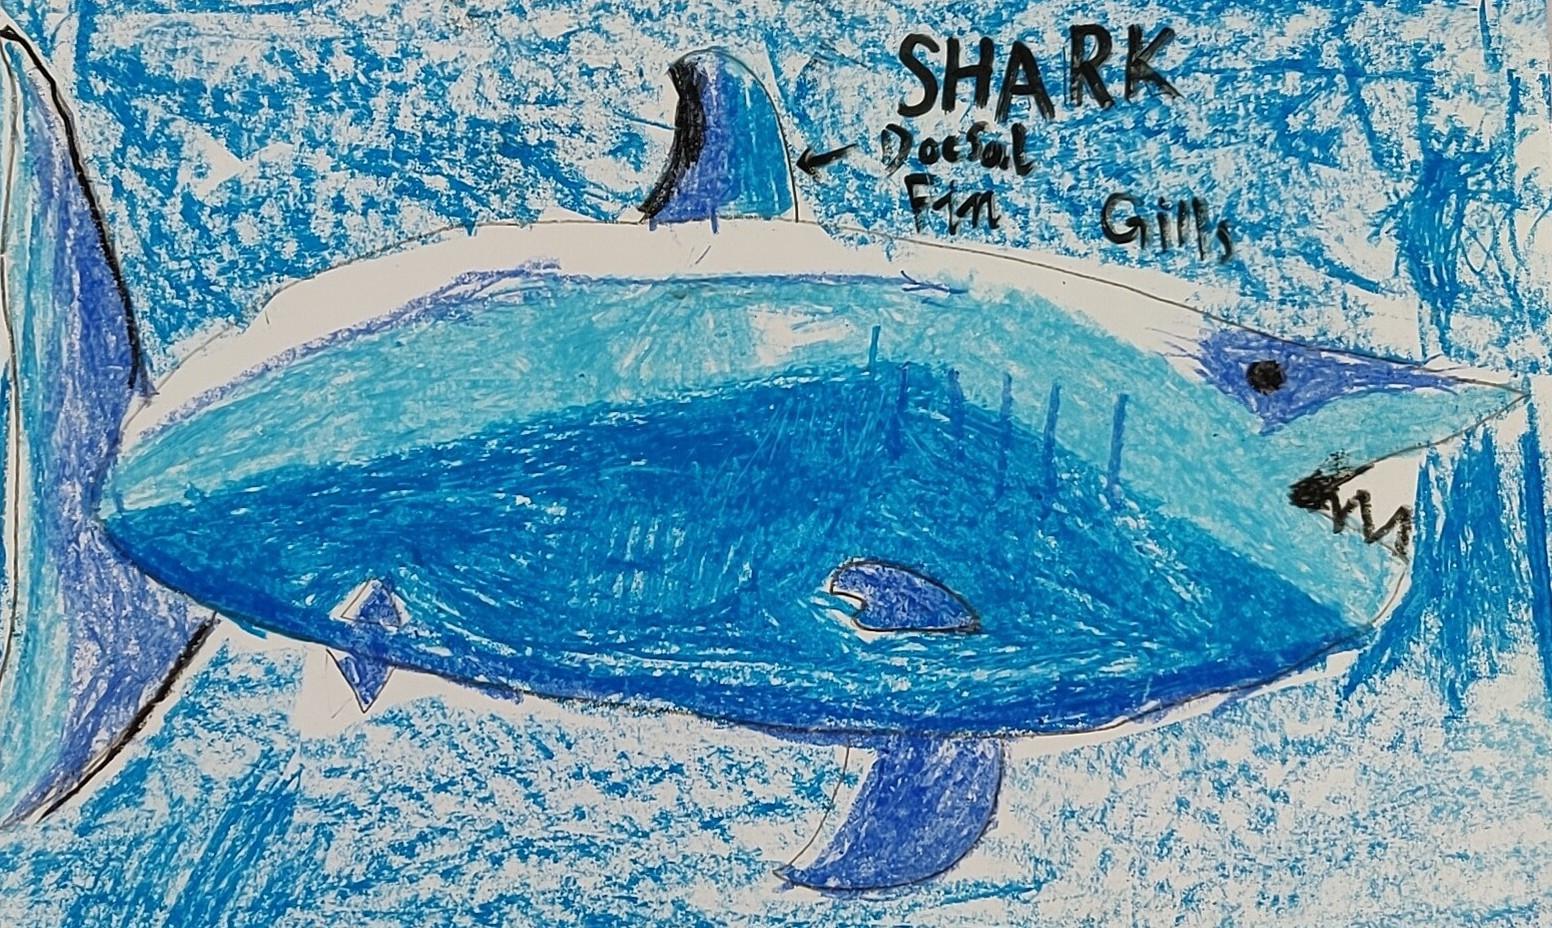 Sharks.jpeg